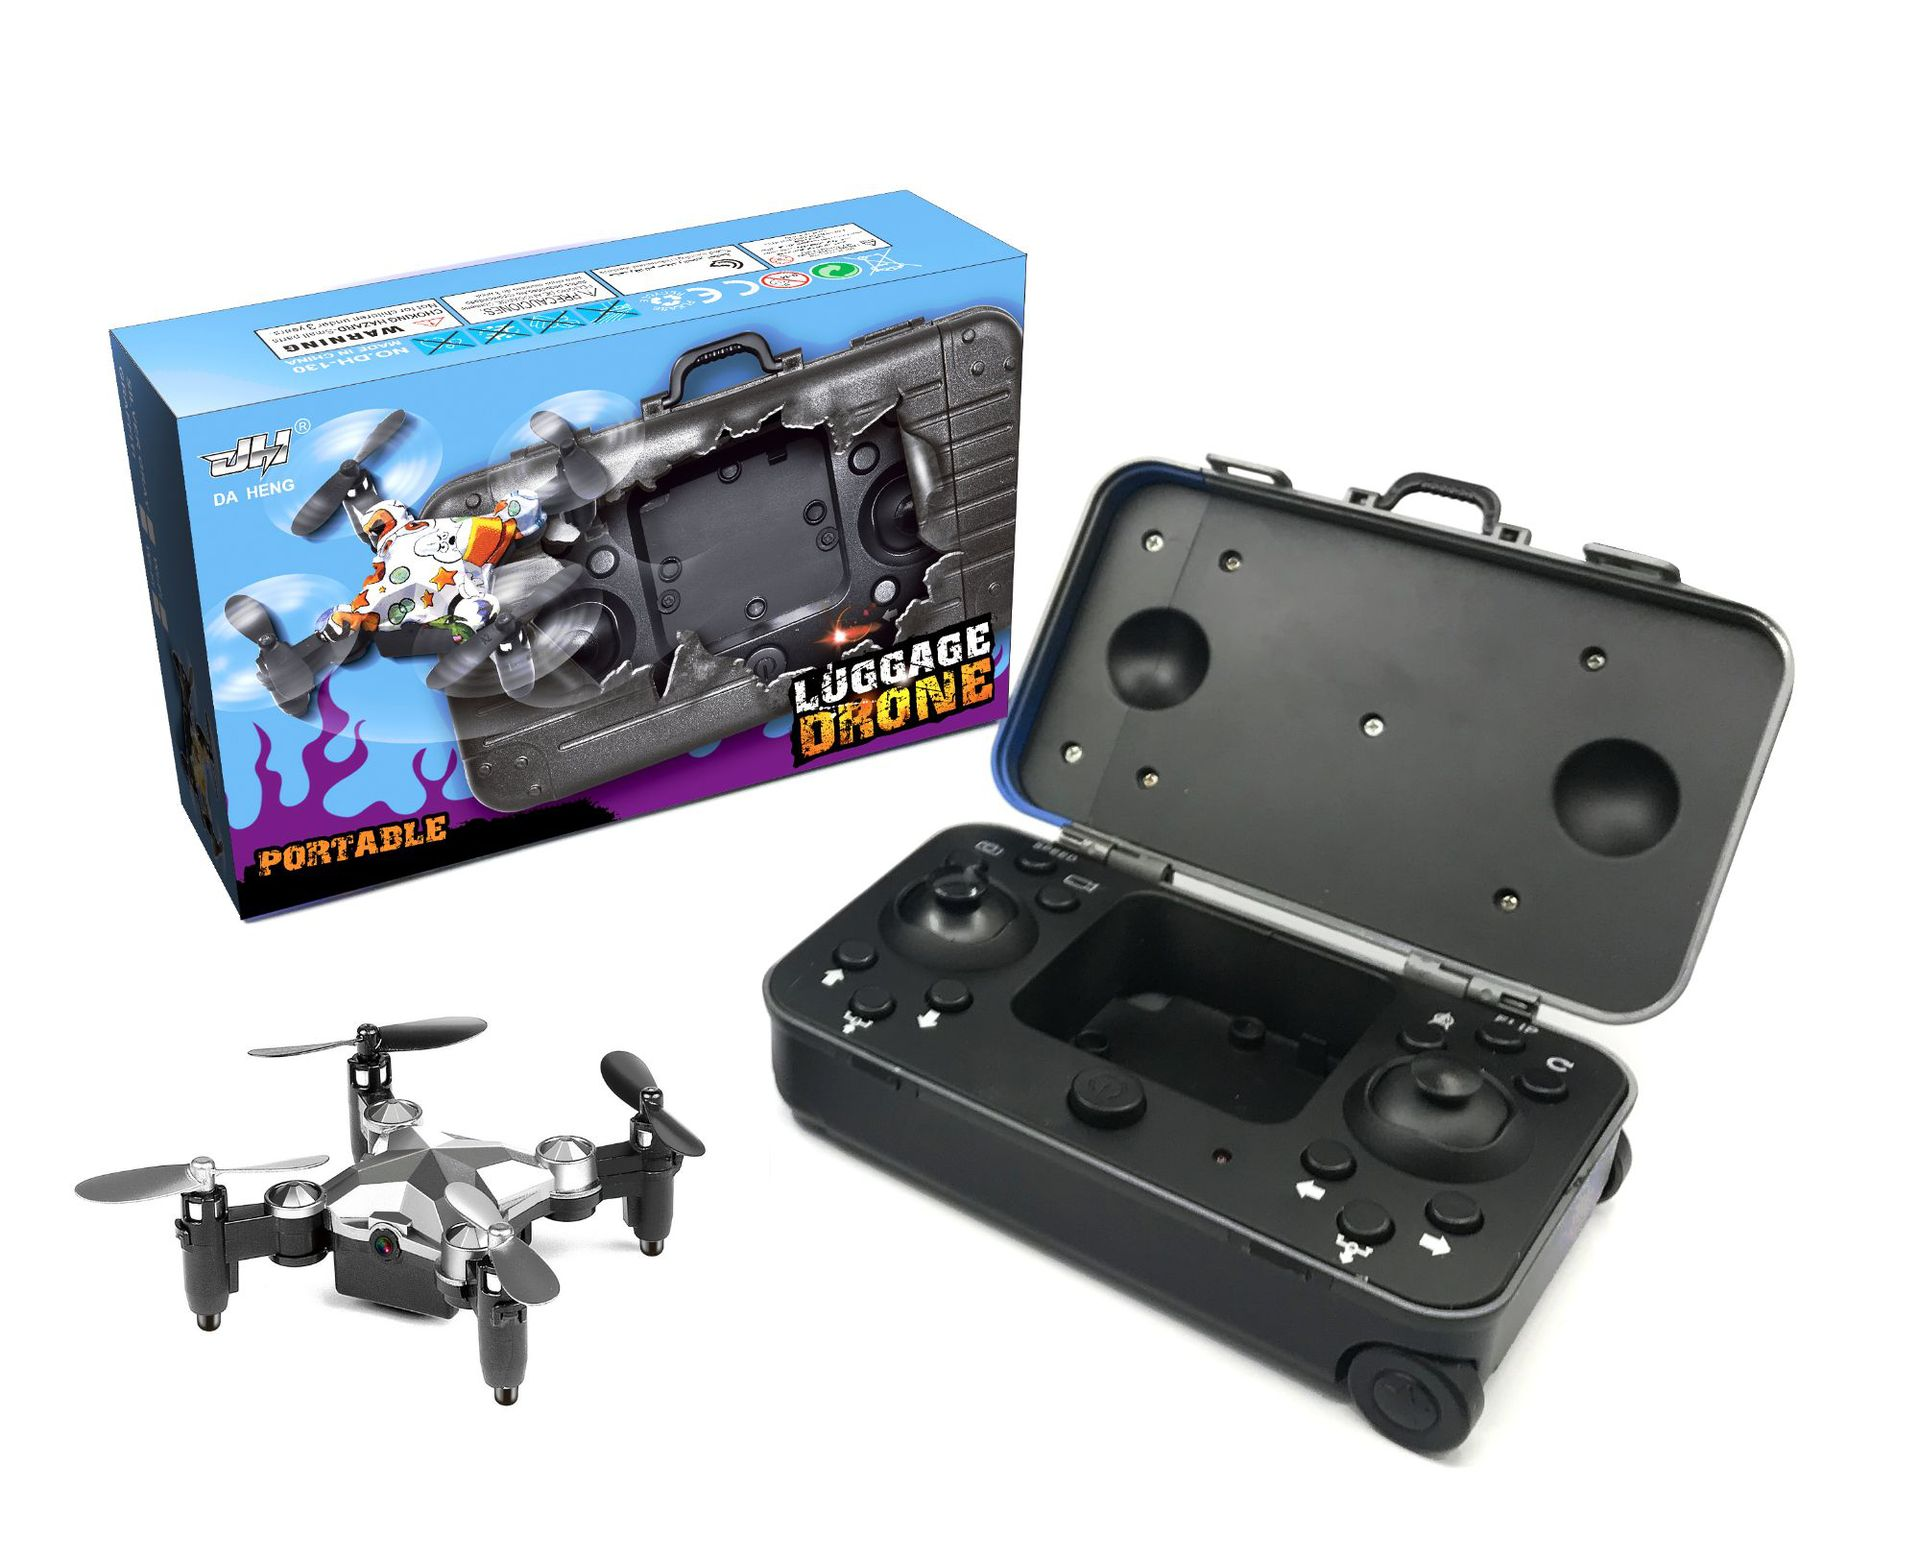 DIANYU Douyin Kuaishou the same luggage watch drone folding aerial photography mini smart remote con